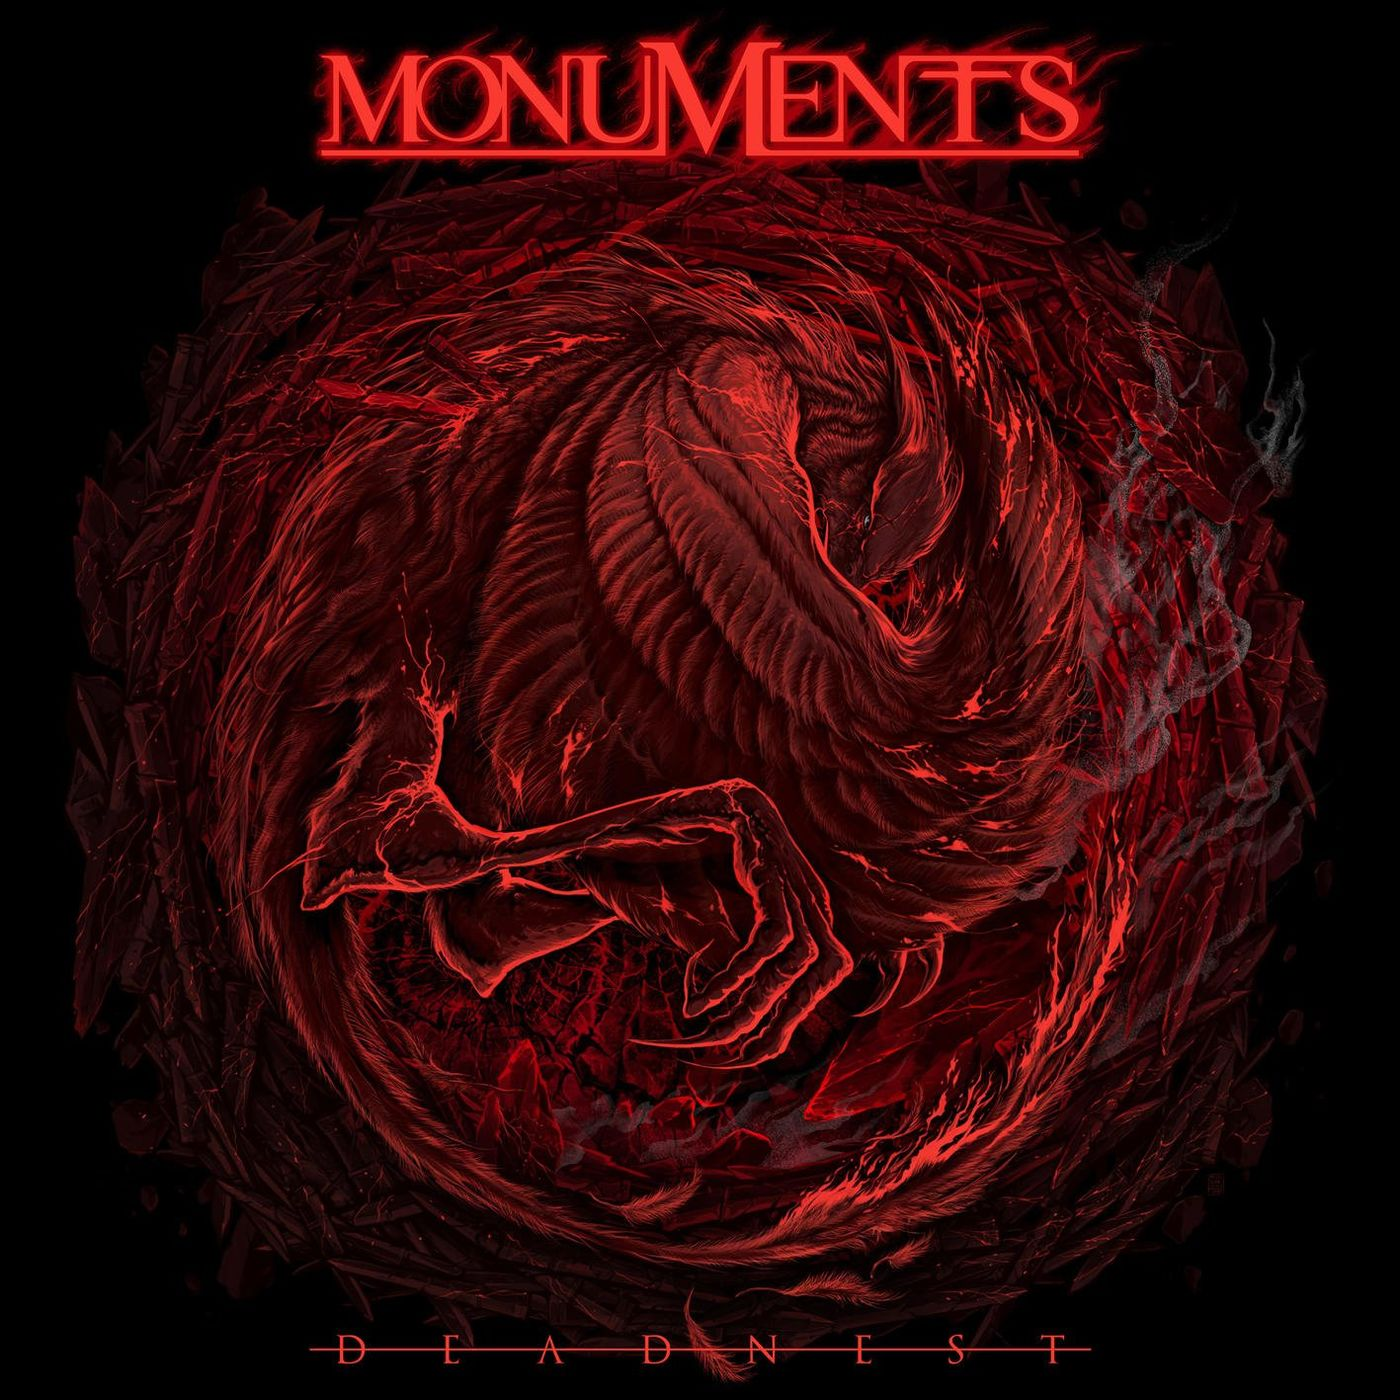 Monuments - Deadnest [single] (2021)